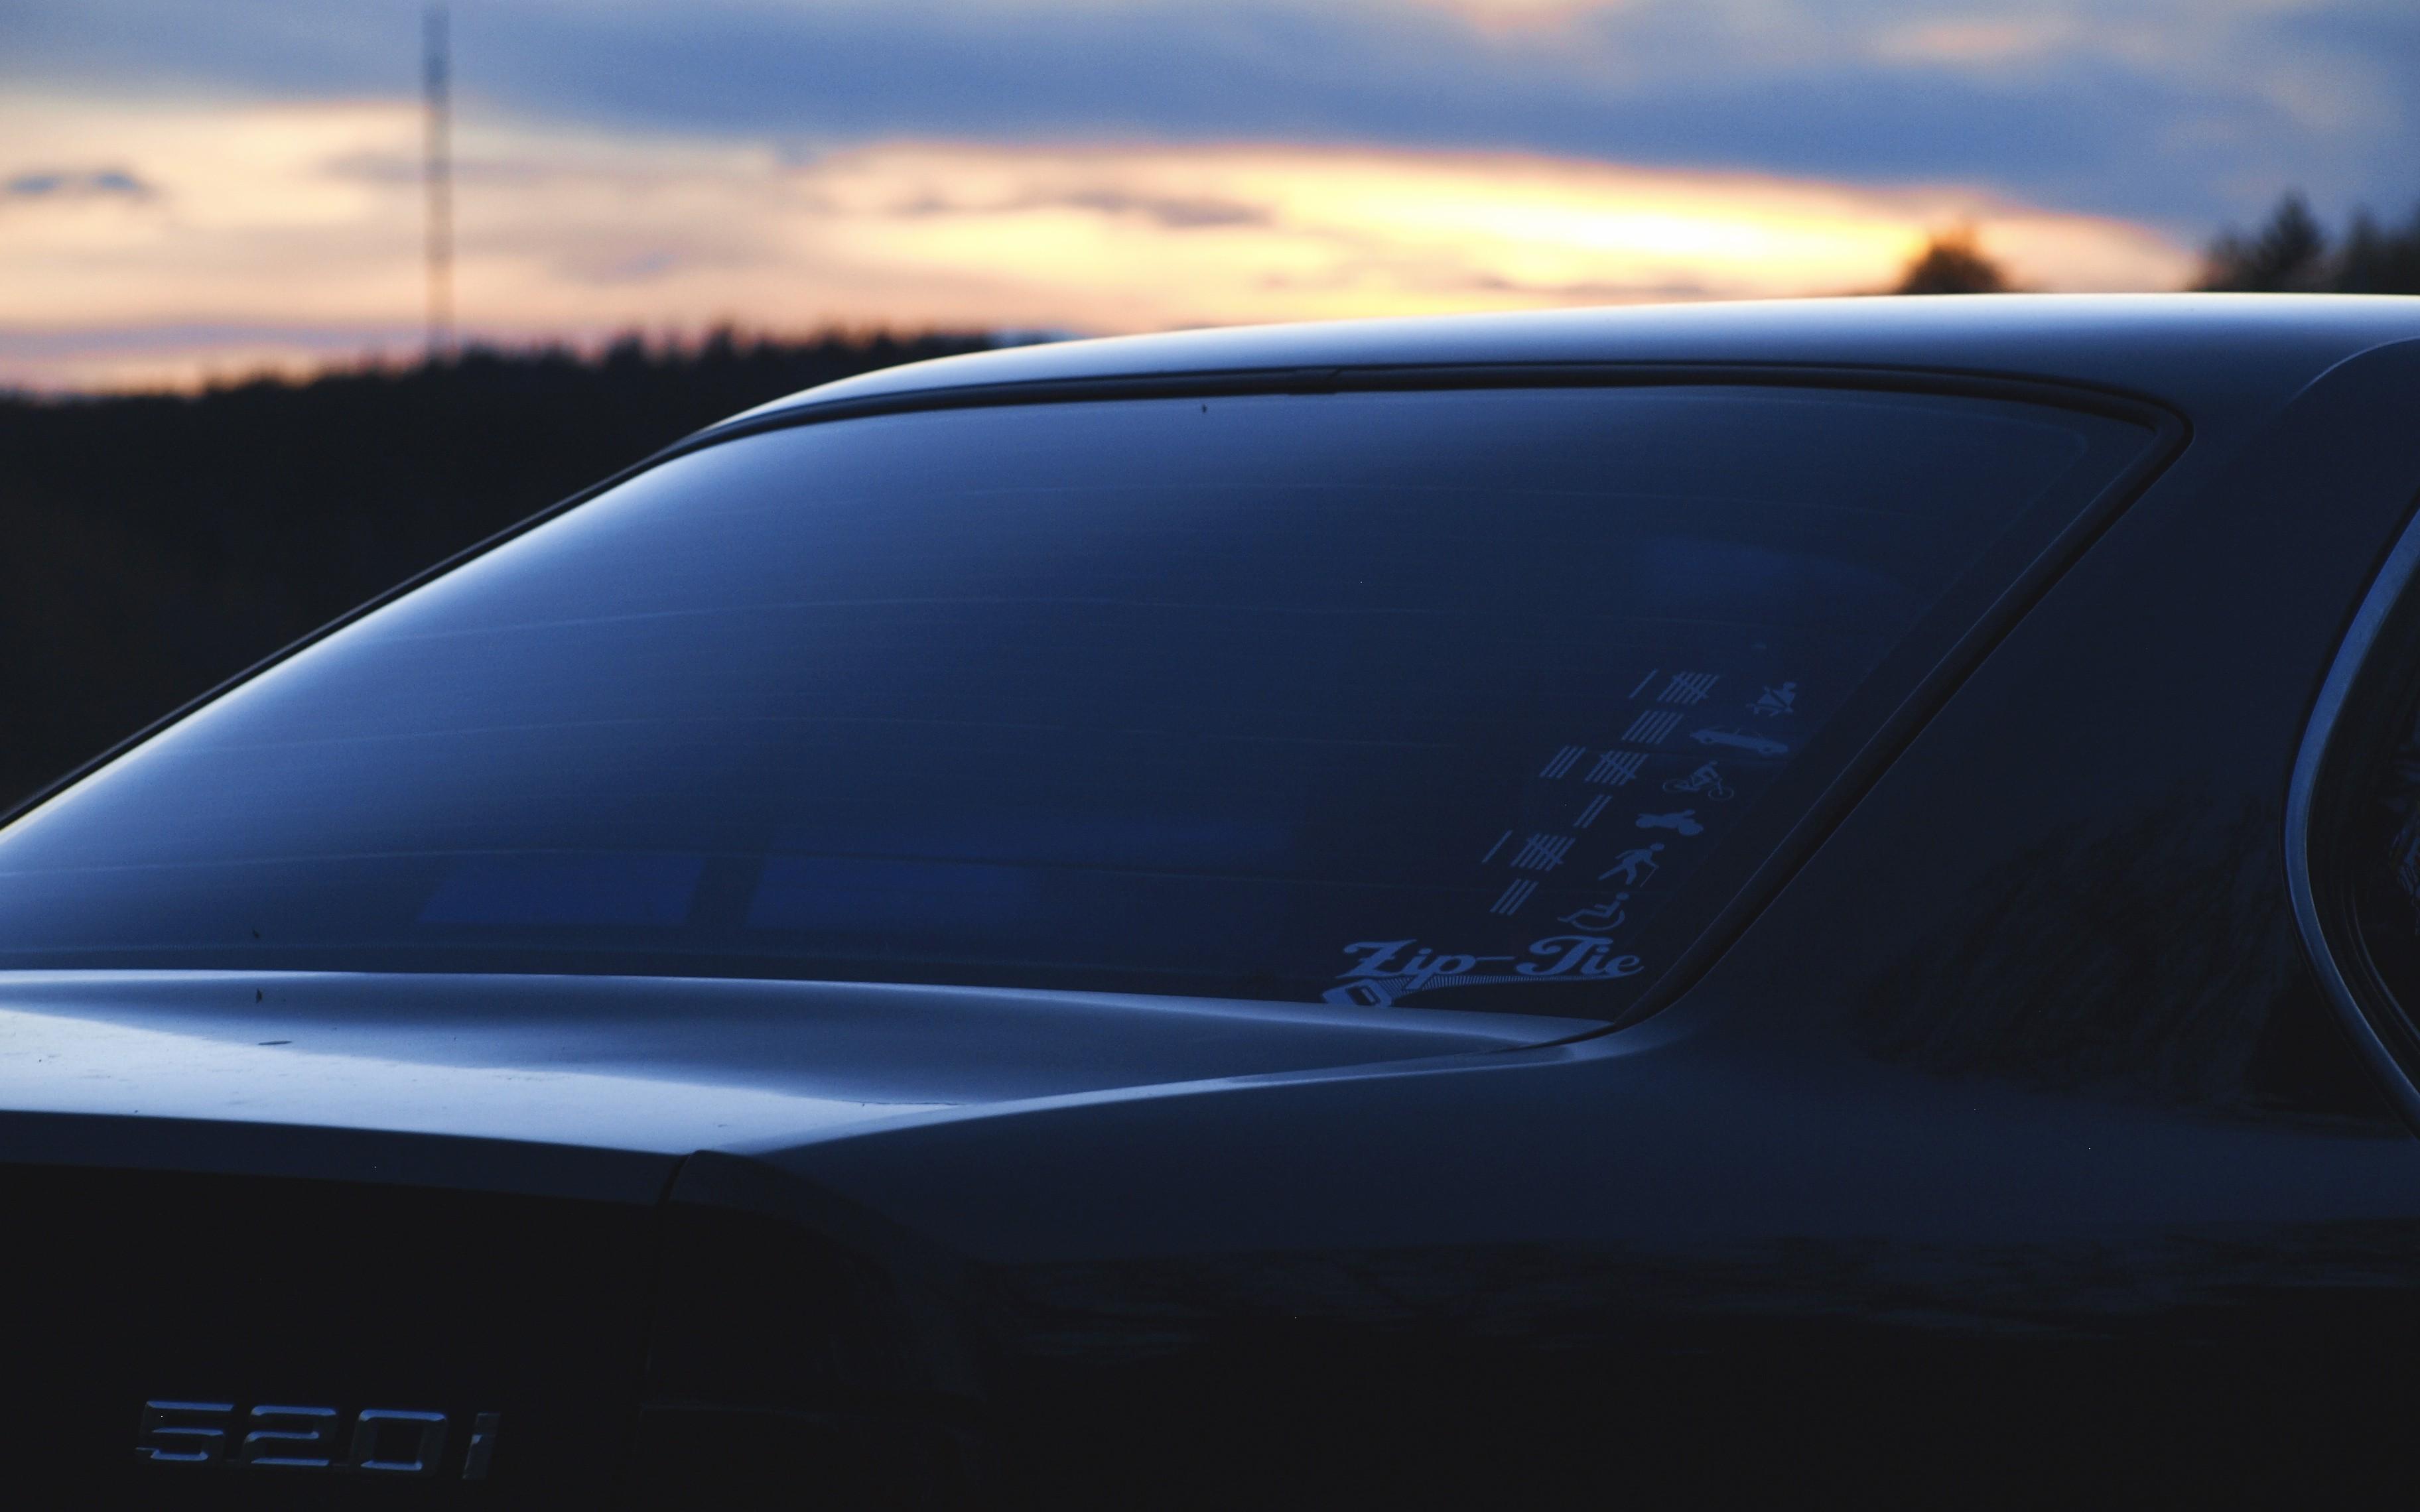 Wallpaper Car Vehicle Bmw E34 Bmw E34 535i Sunset